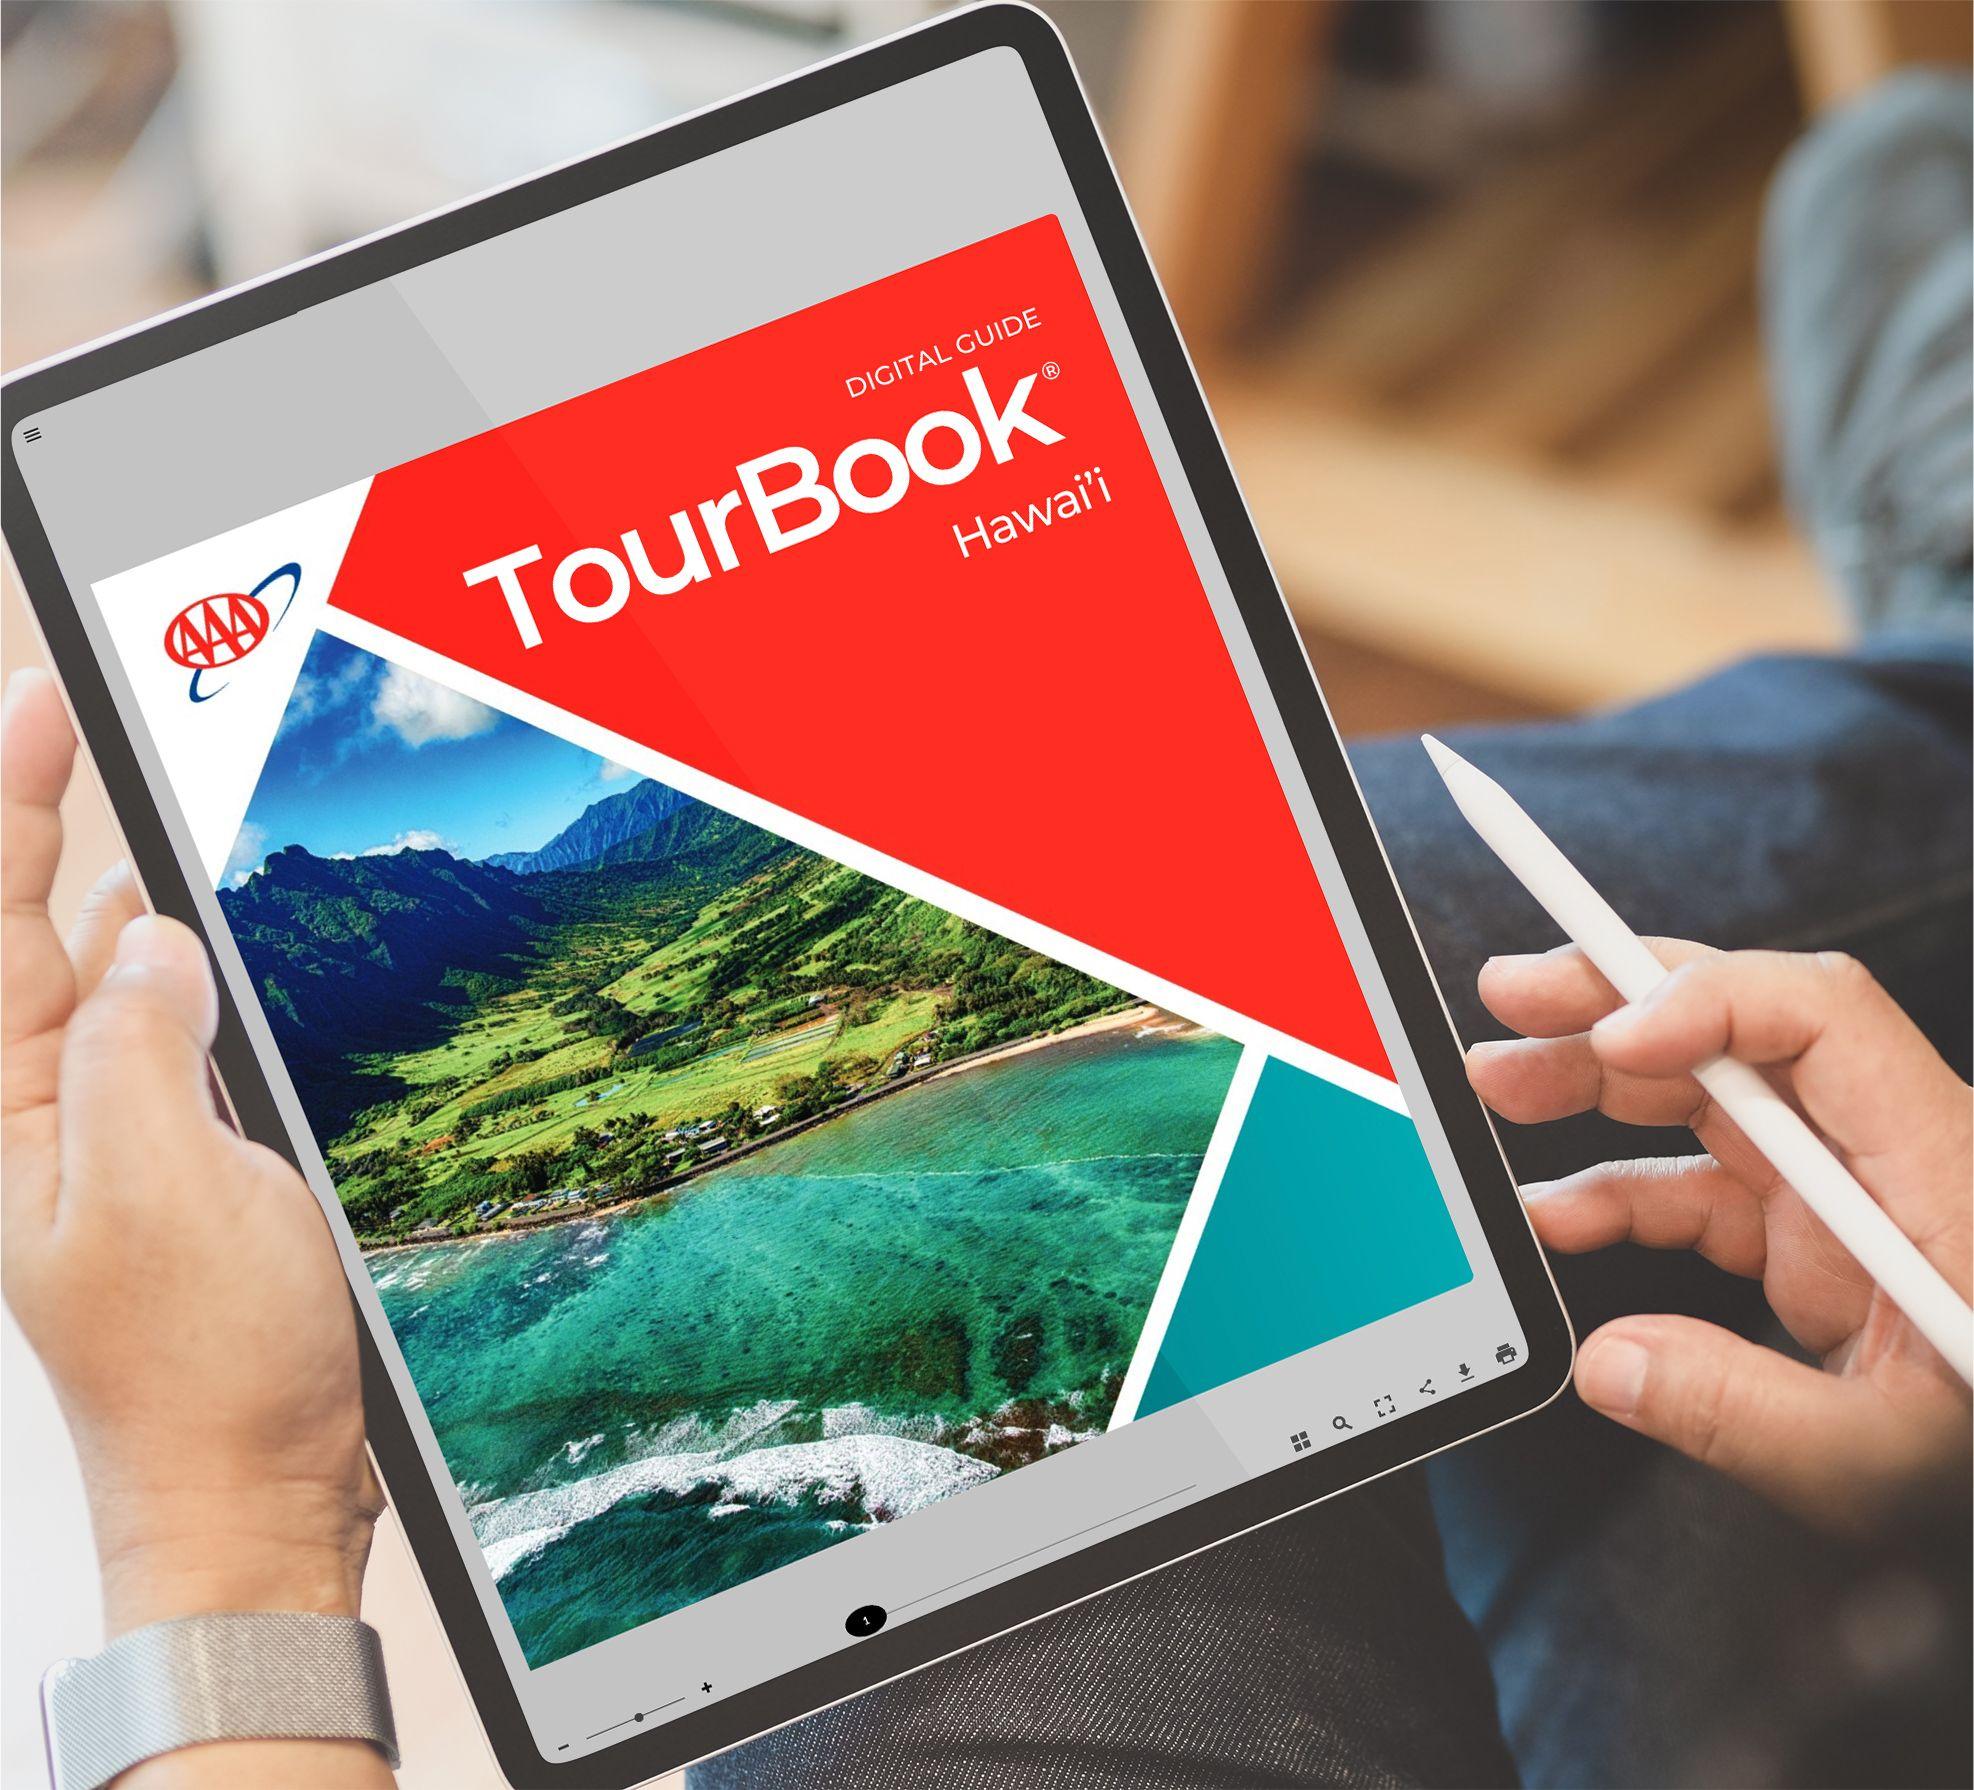 Hawaii Tourbook on a Tablet